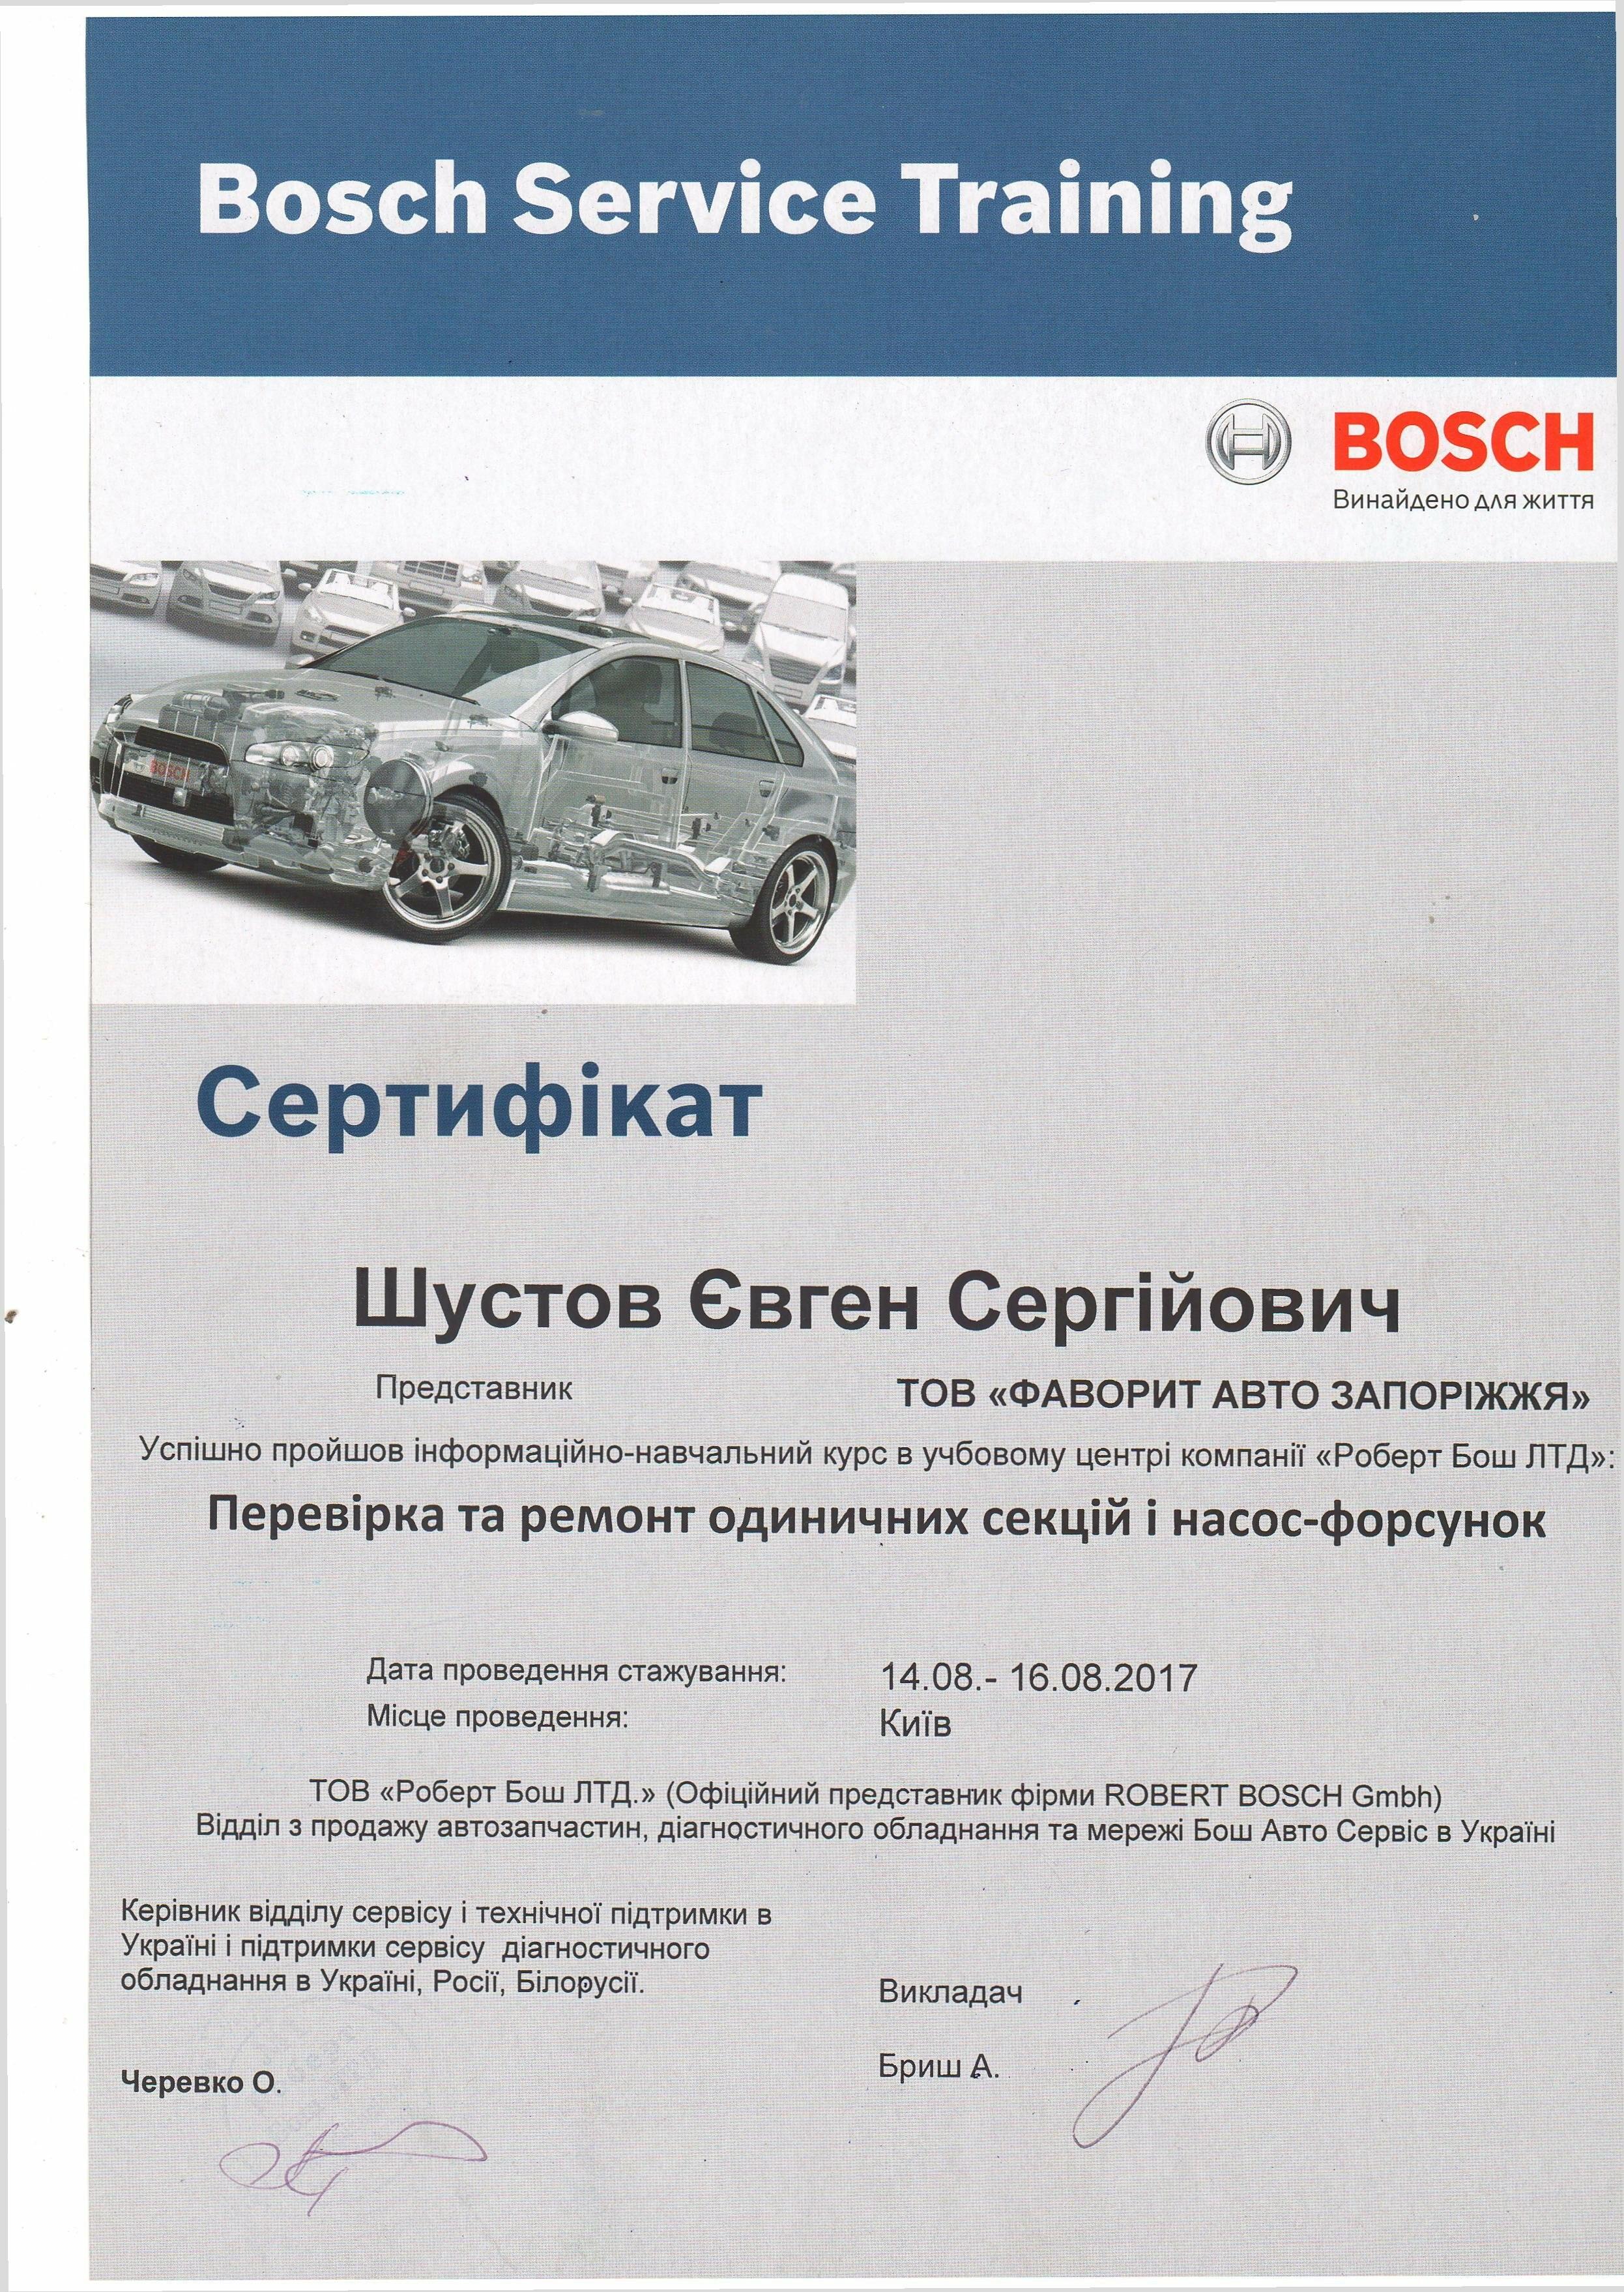 Сертификаты предприятия и специалистов, фото-6